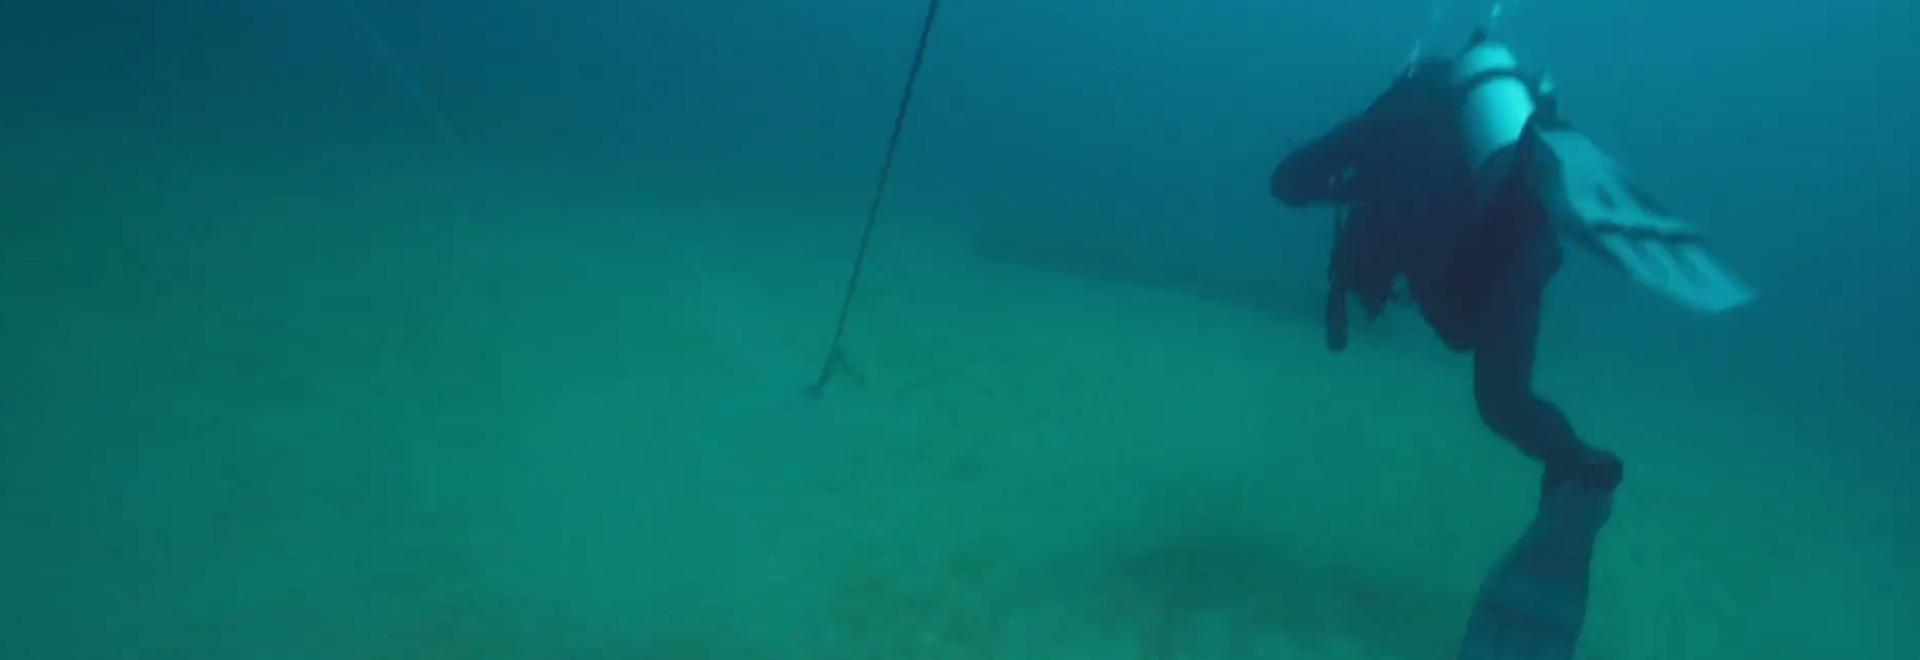 C'è un vagone sott'acqua!